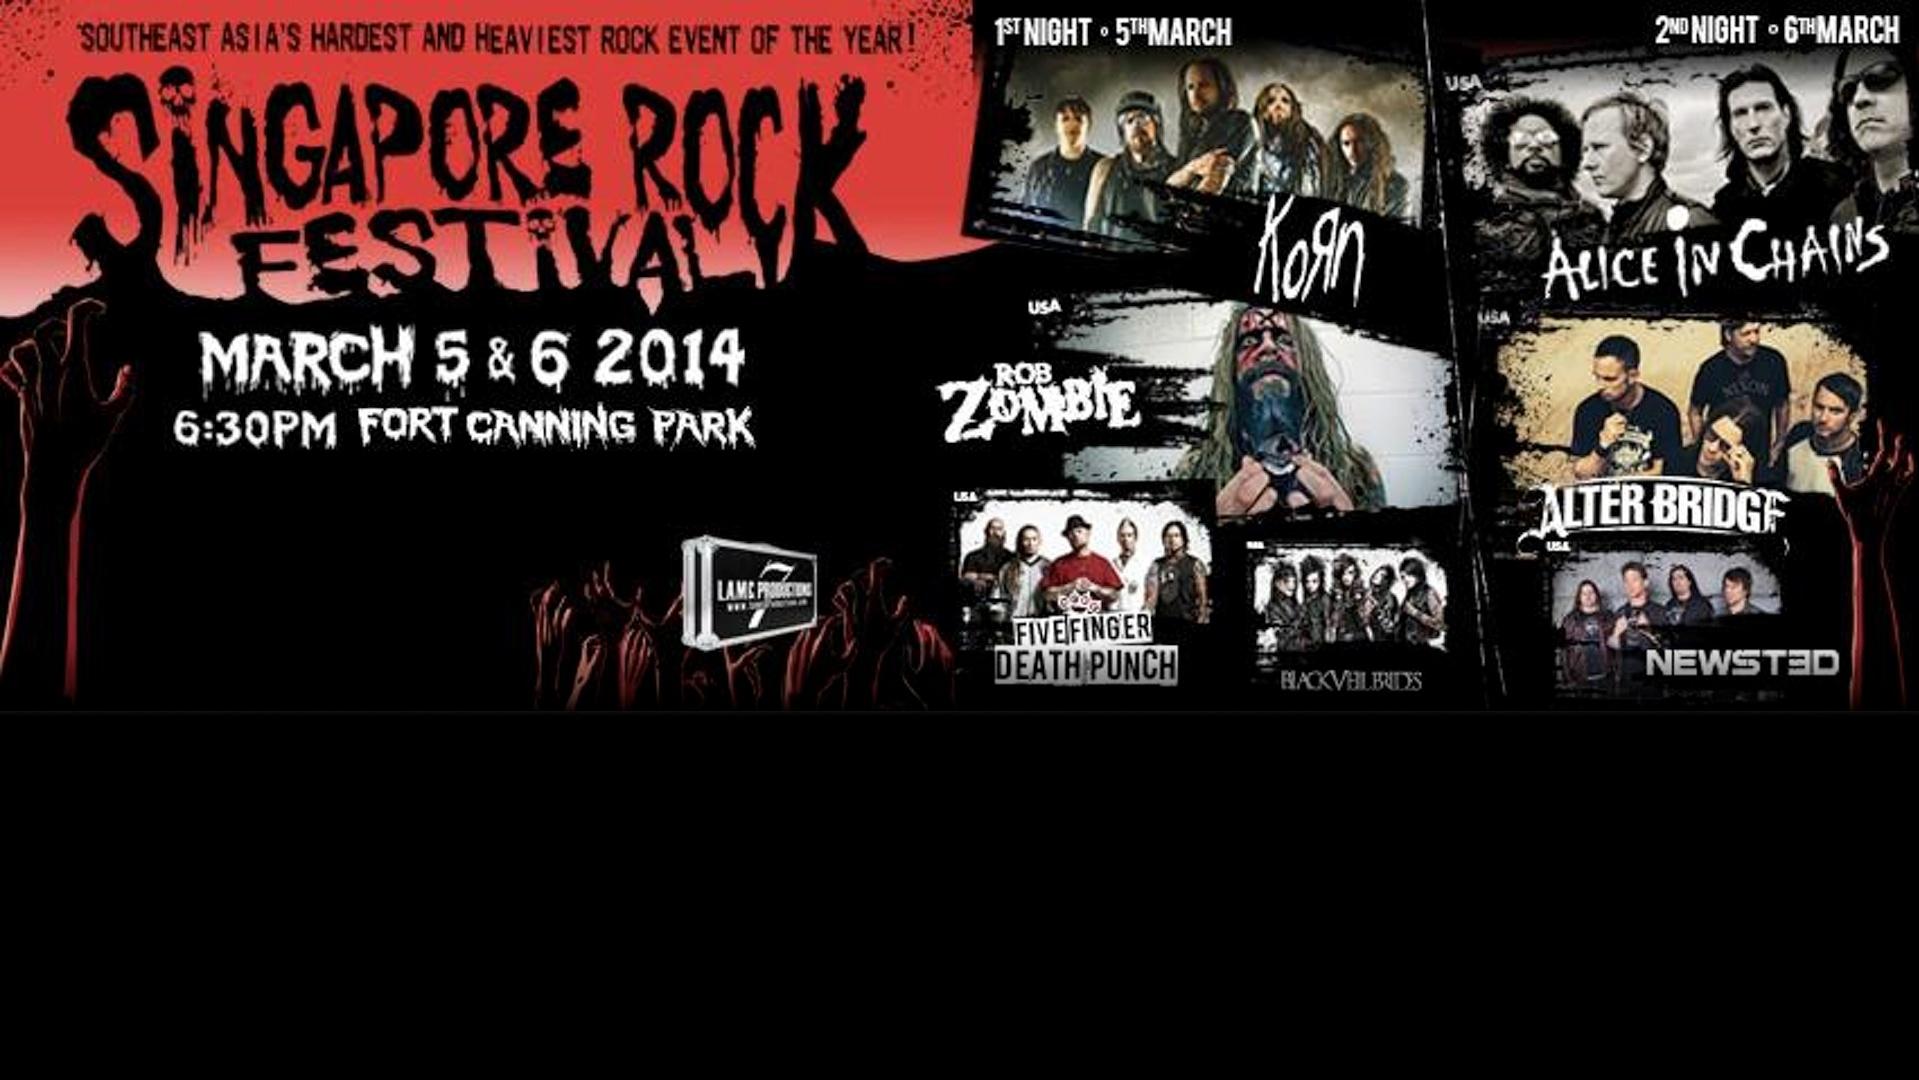 Singapore Rock Festival 2014 (Day 1)